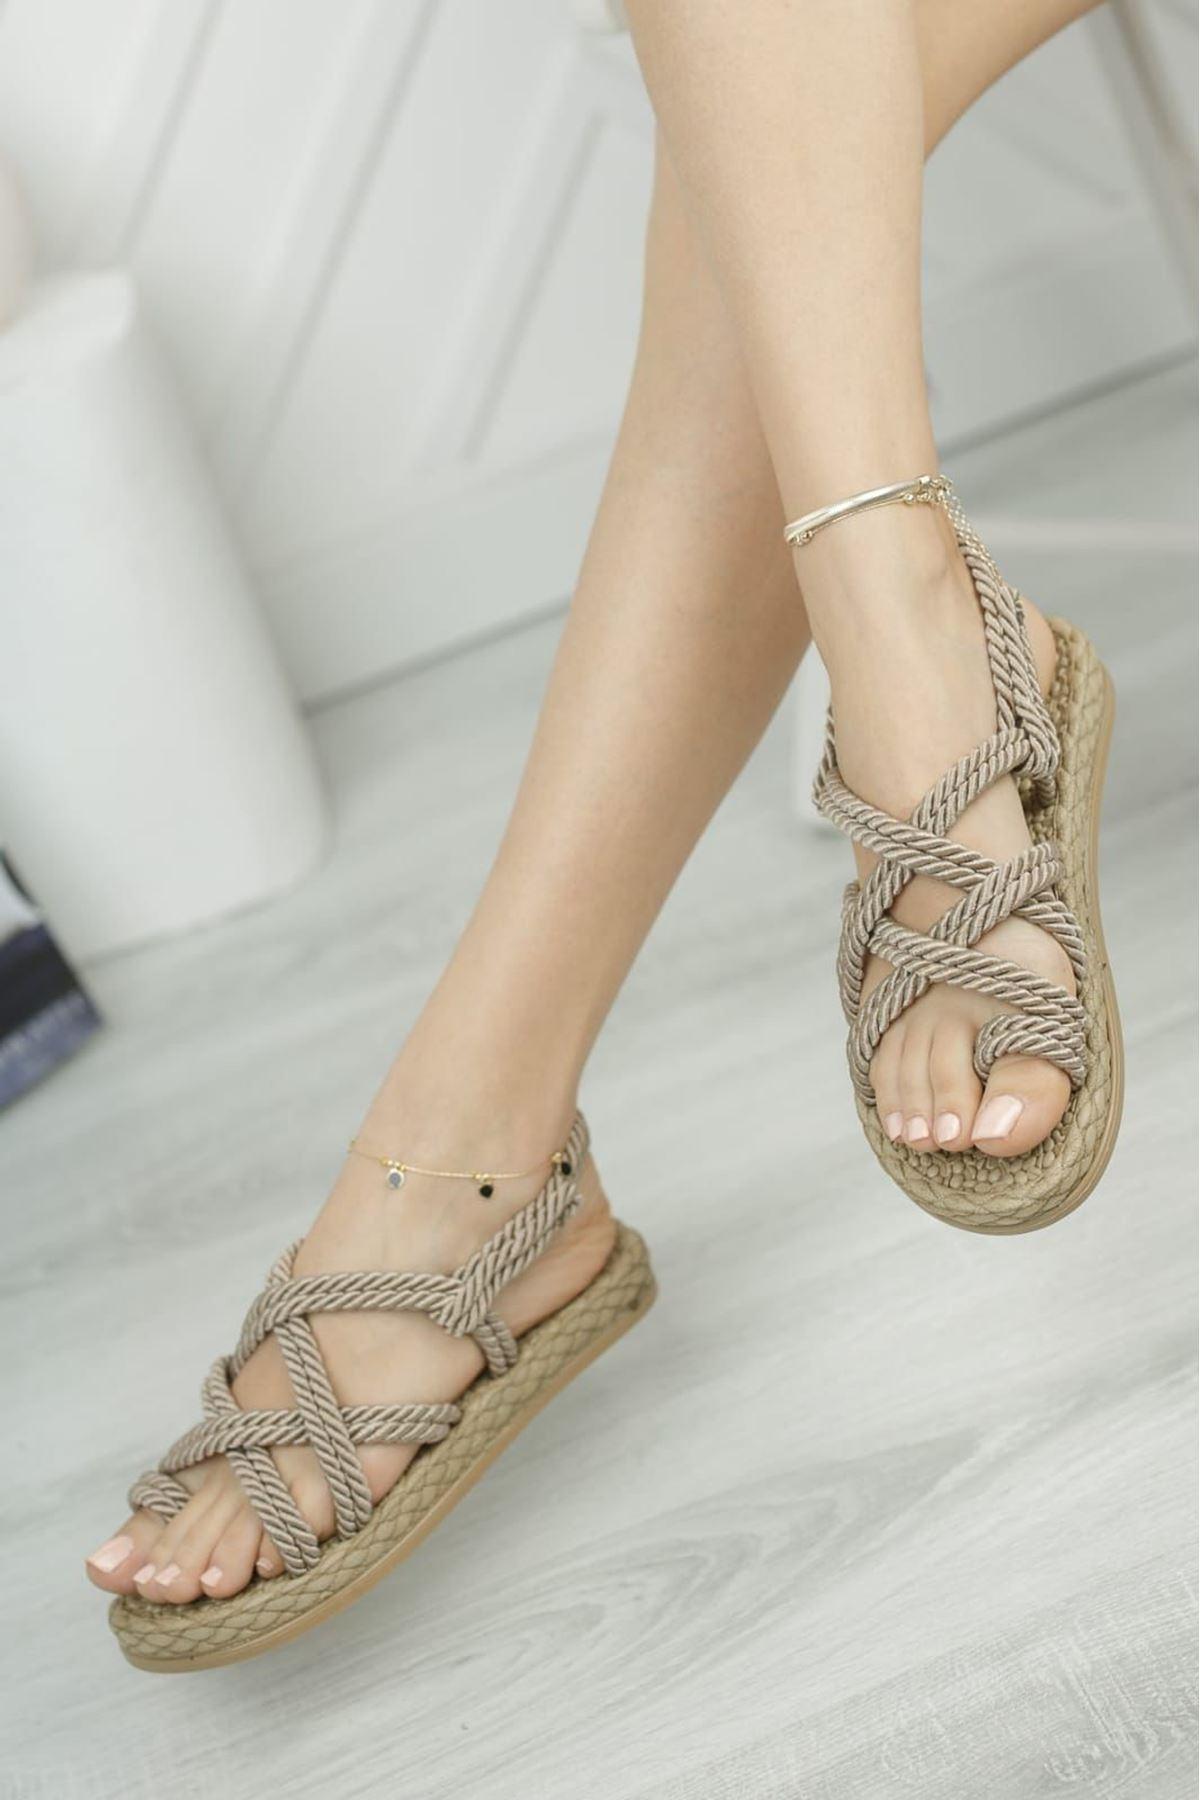 Nala Vızon Halatli Sandalet